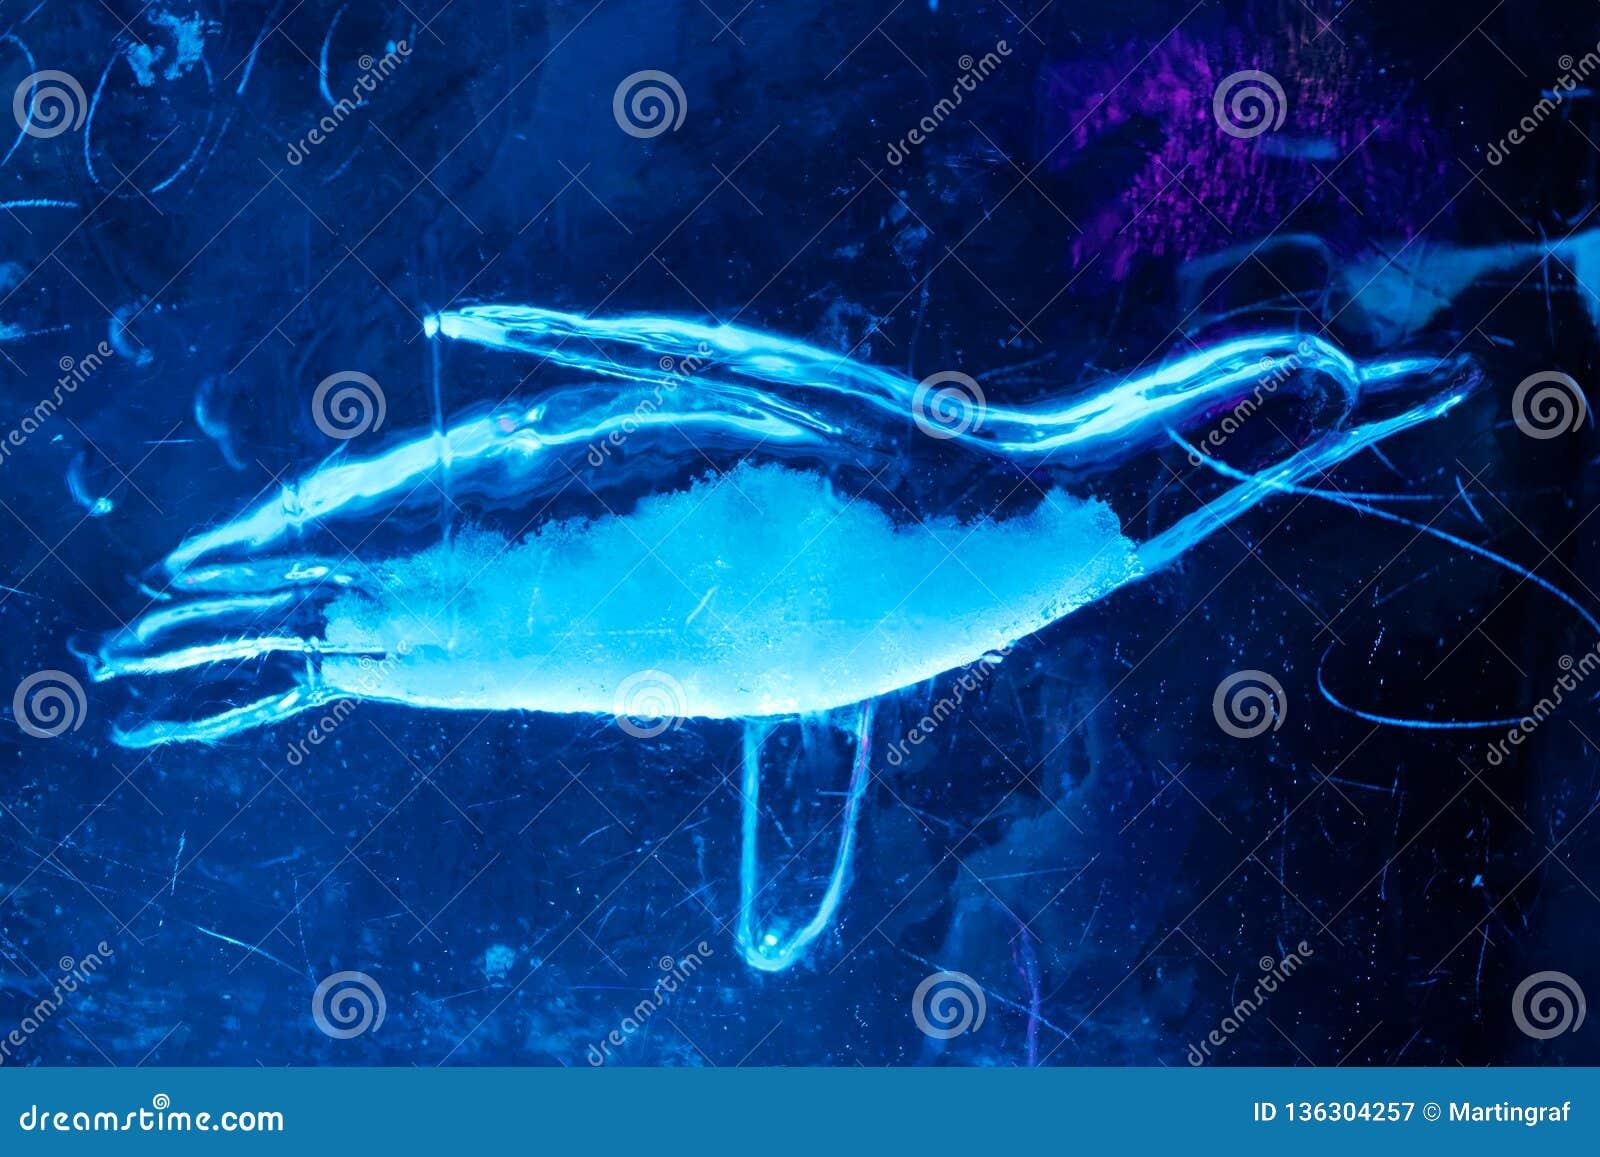 Swimming penguin ice sculpture underwater world art